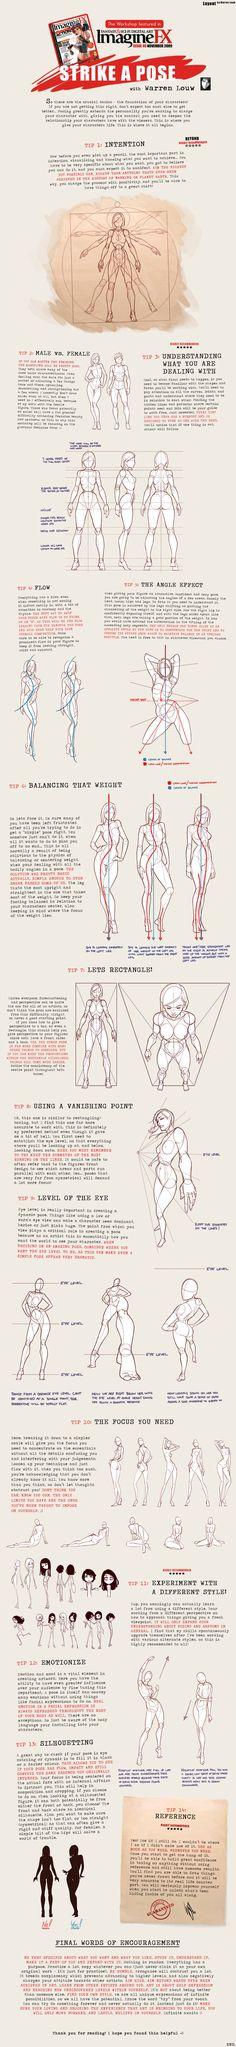 Comic Art Reference - Strike a Pose